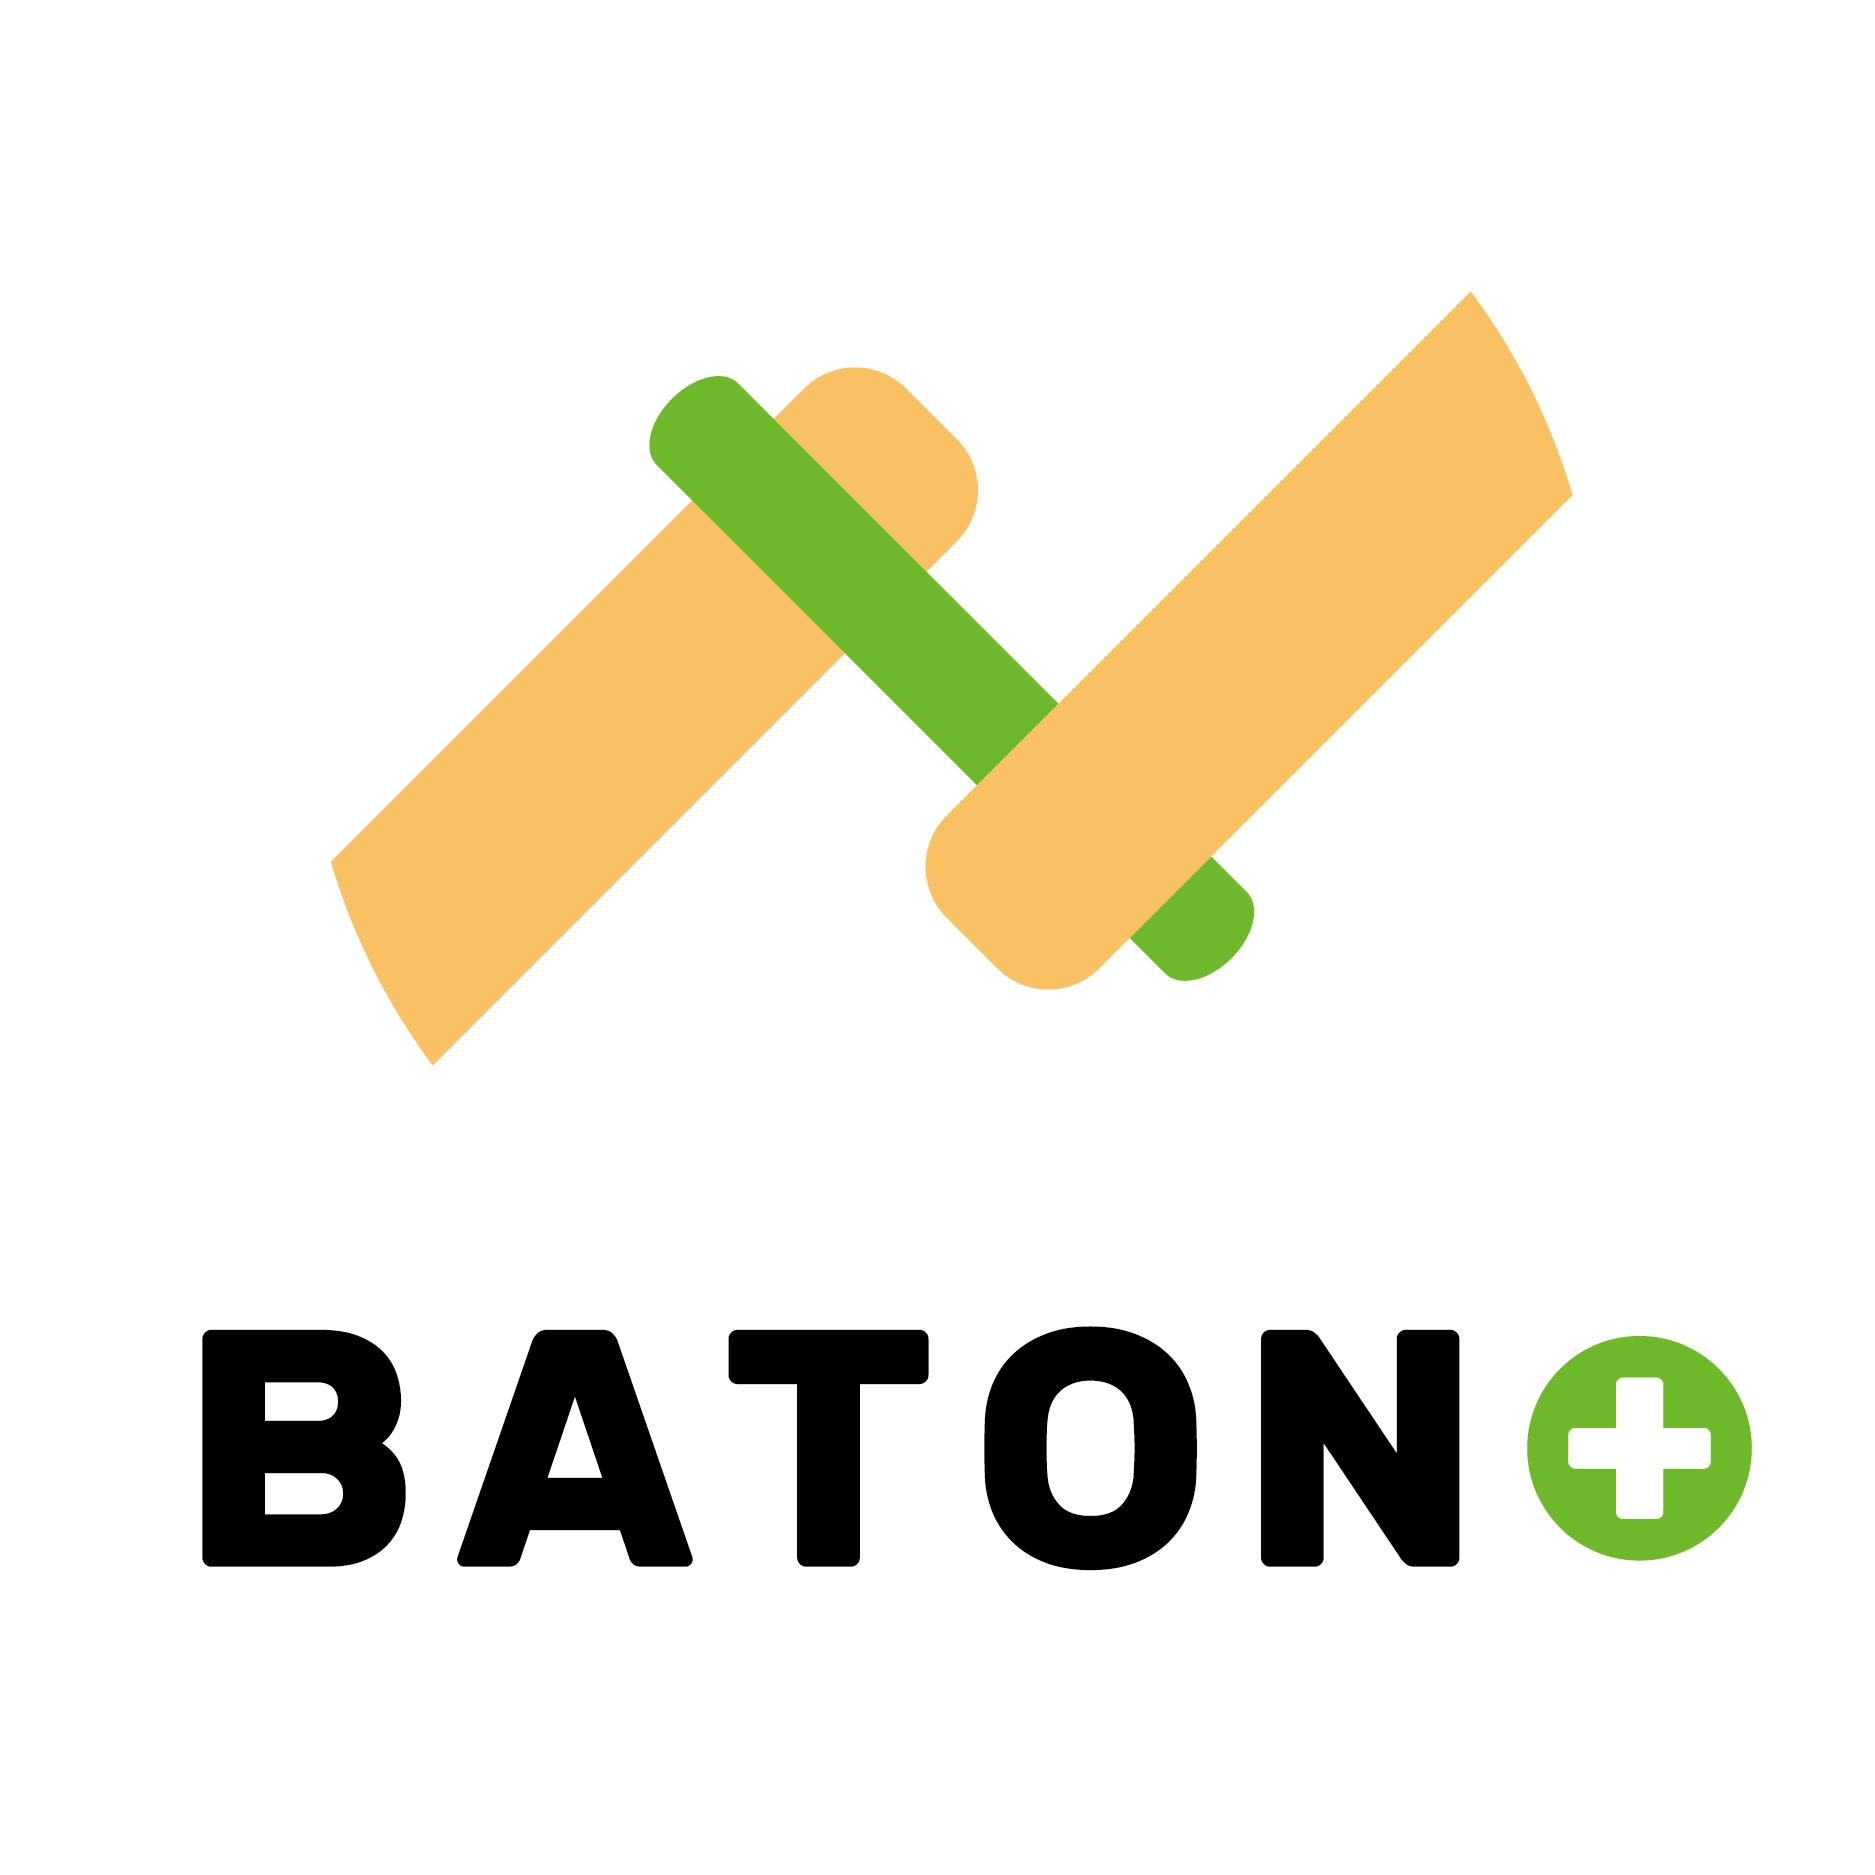 BATON+